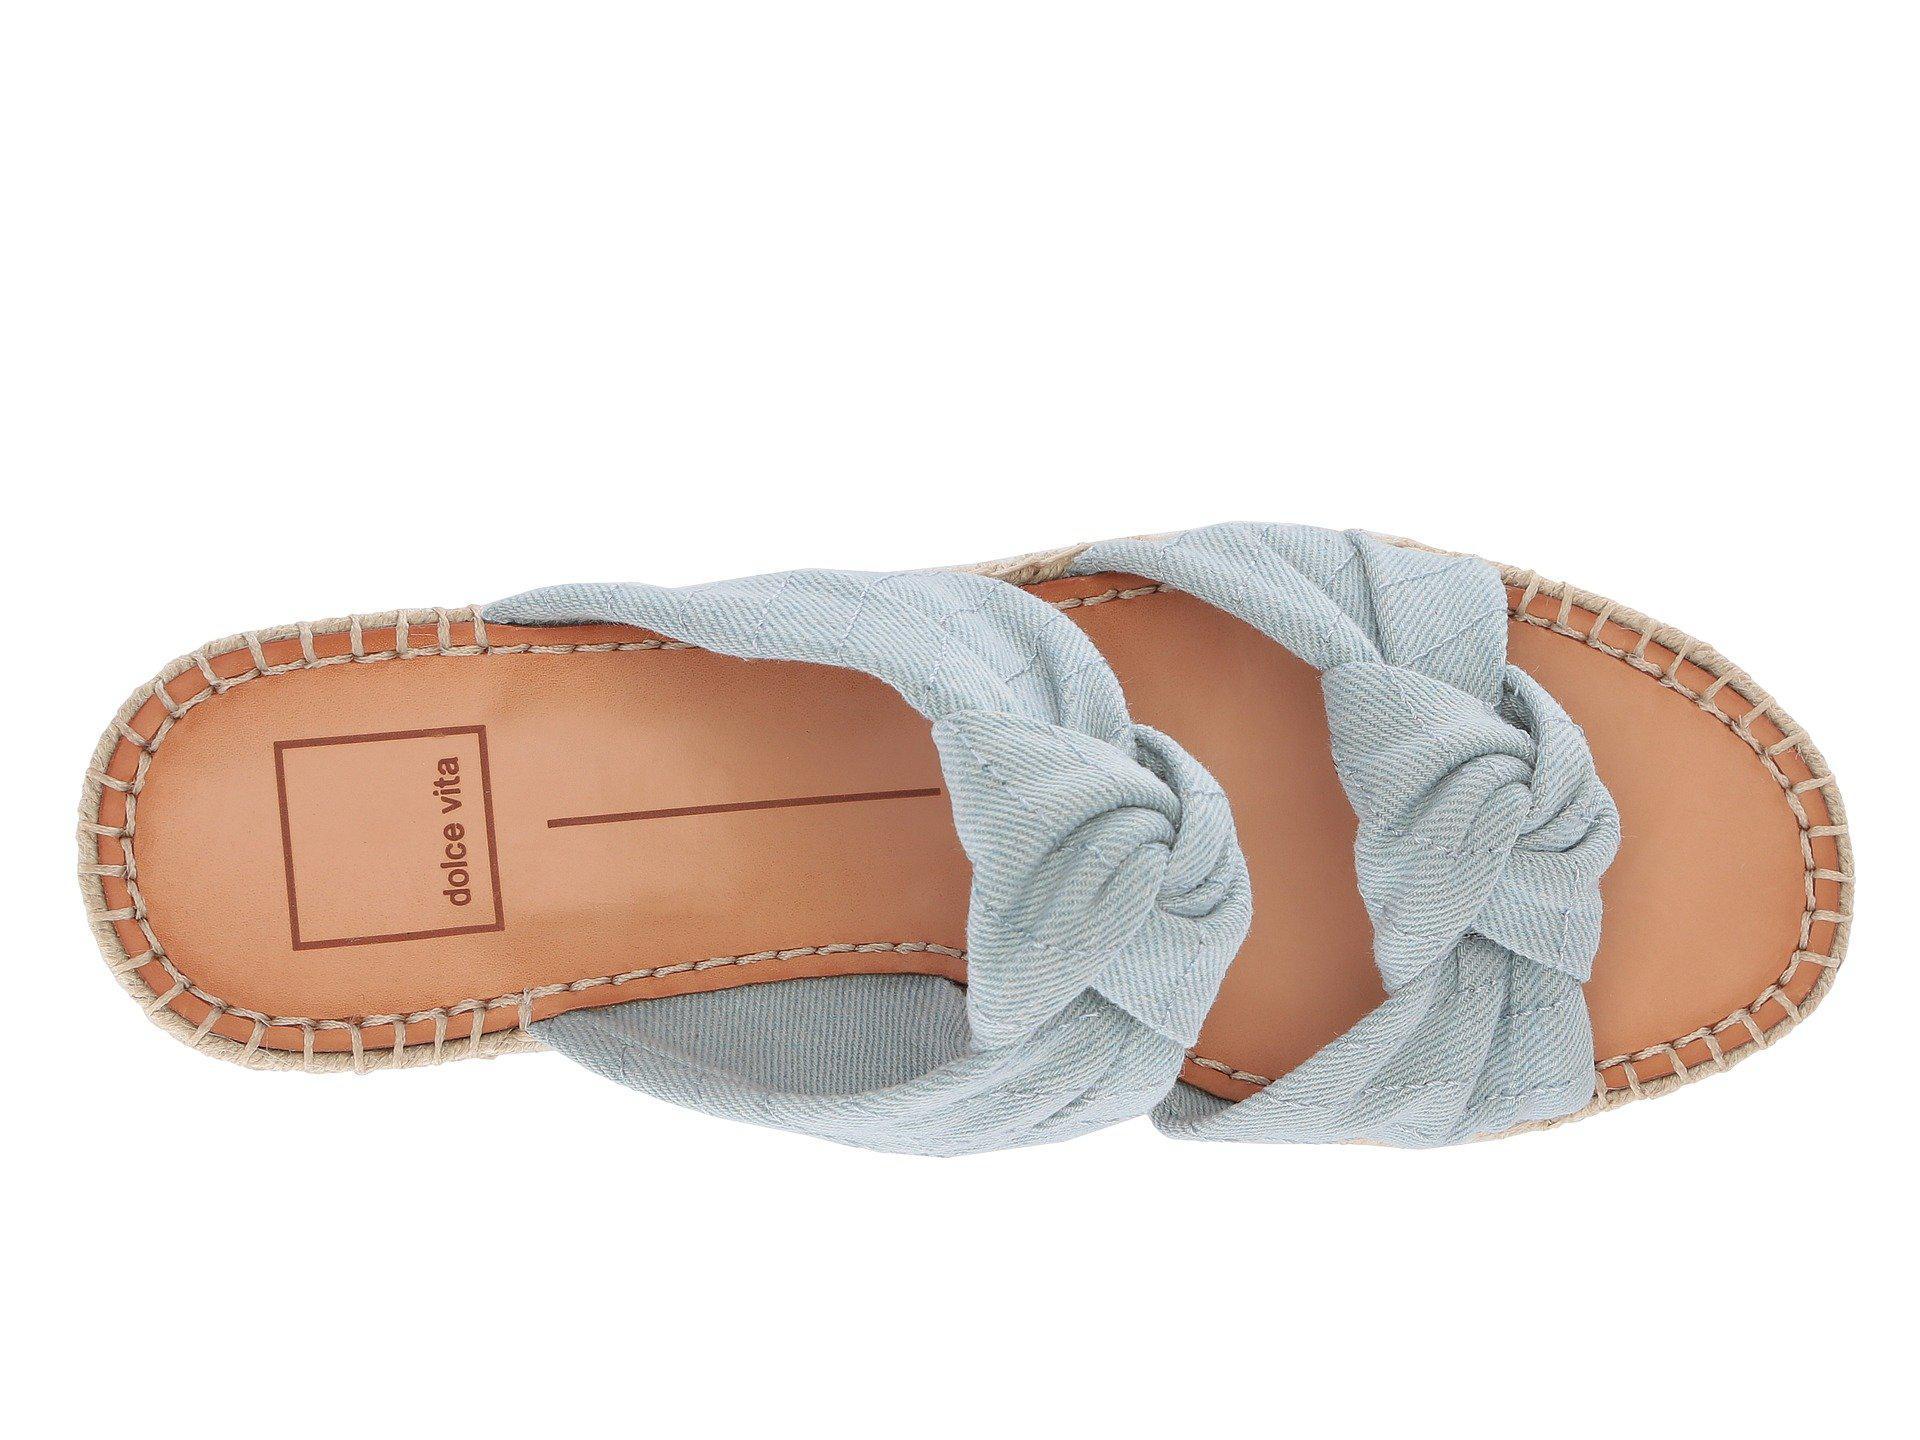 7e0cd41a014 Dolce Vita - Blue Lera Espadrille Wedge Sandal - Lyst. View fullscreen